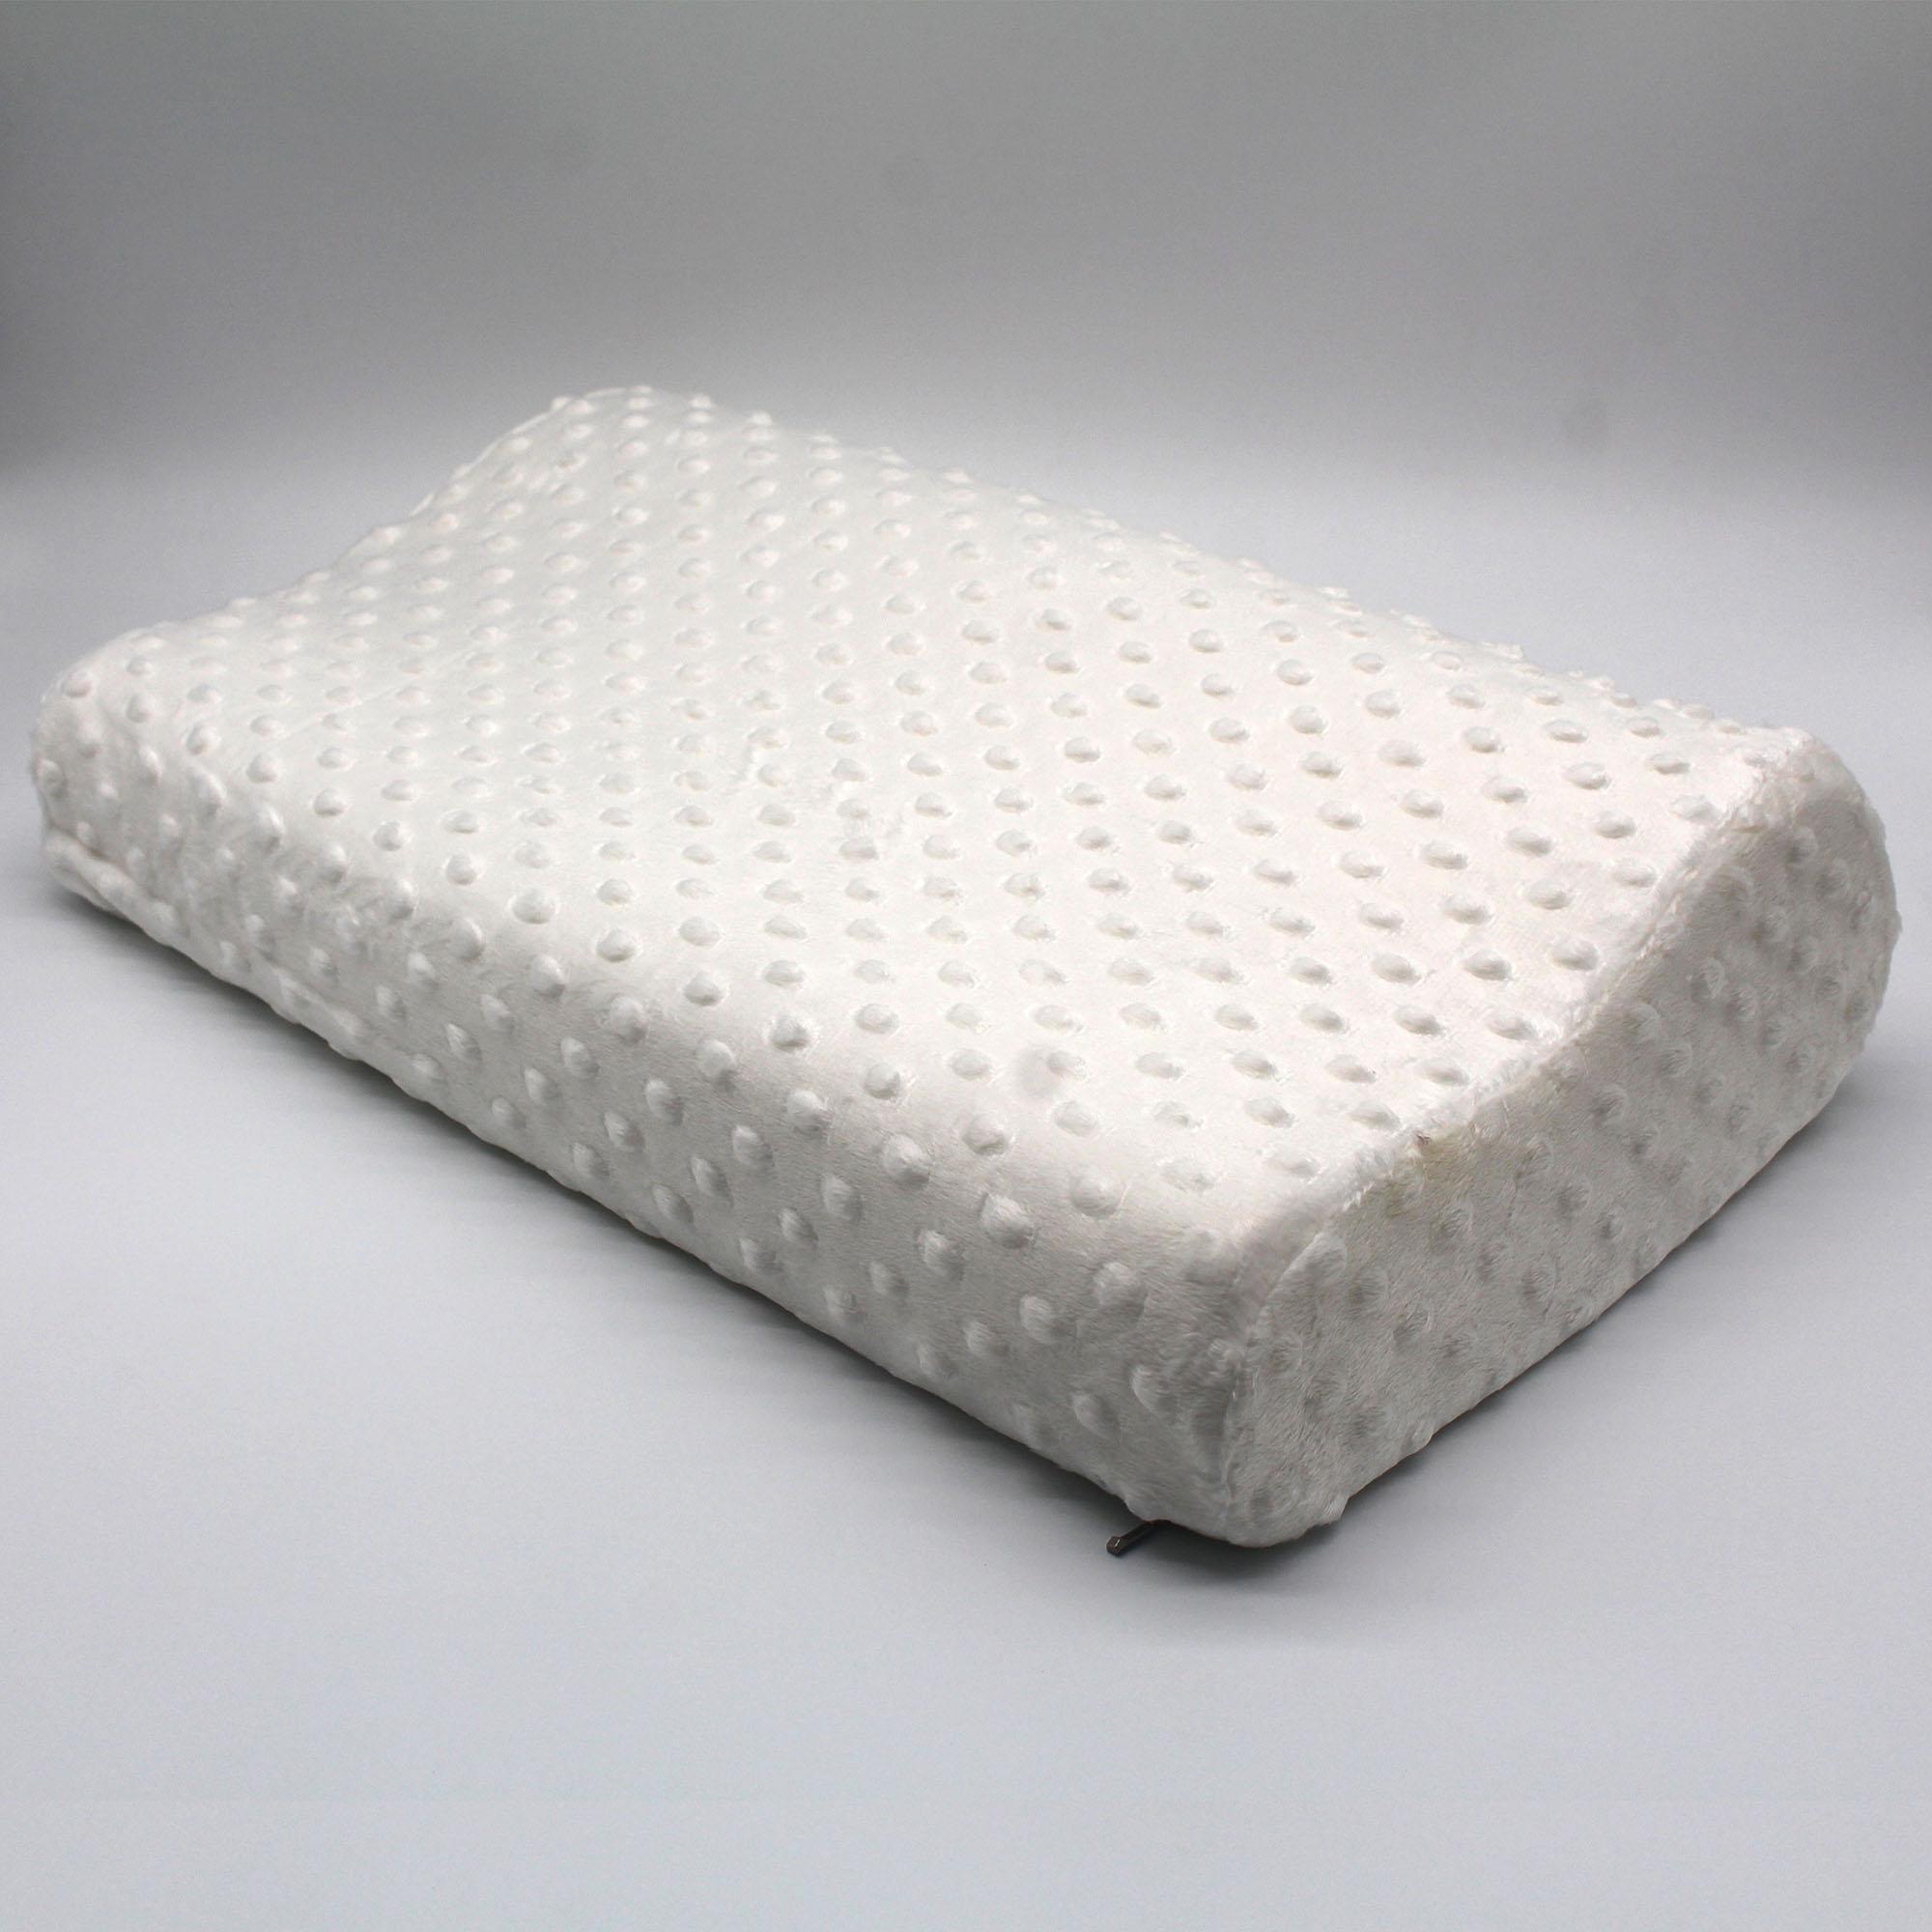 pillow incontinence bedding adult mattress protectors aleva